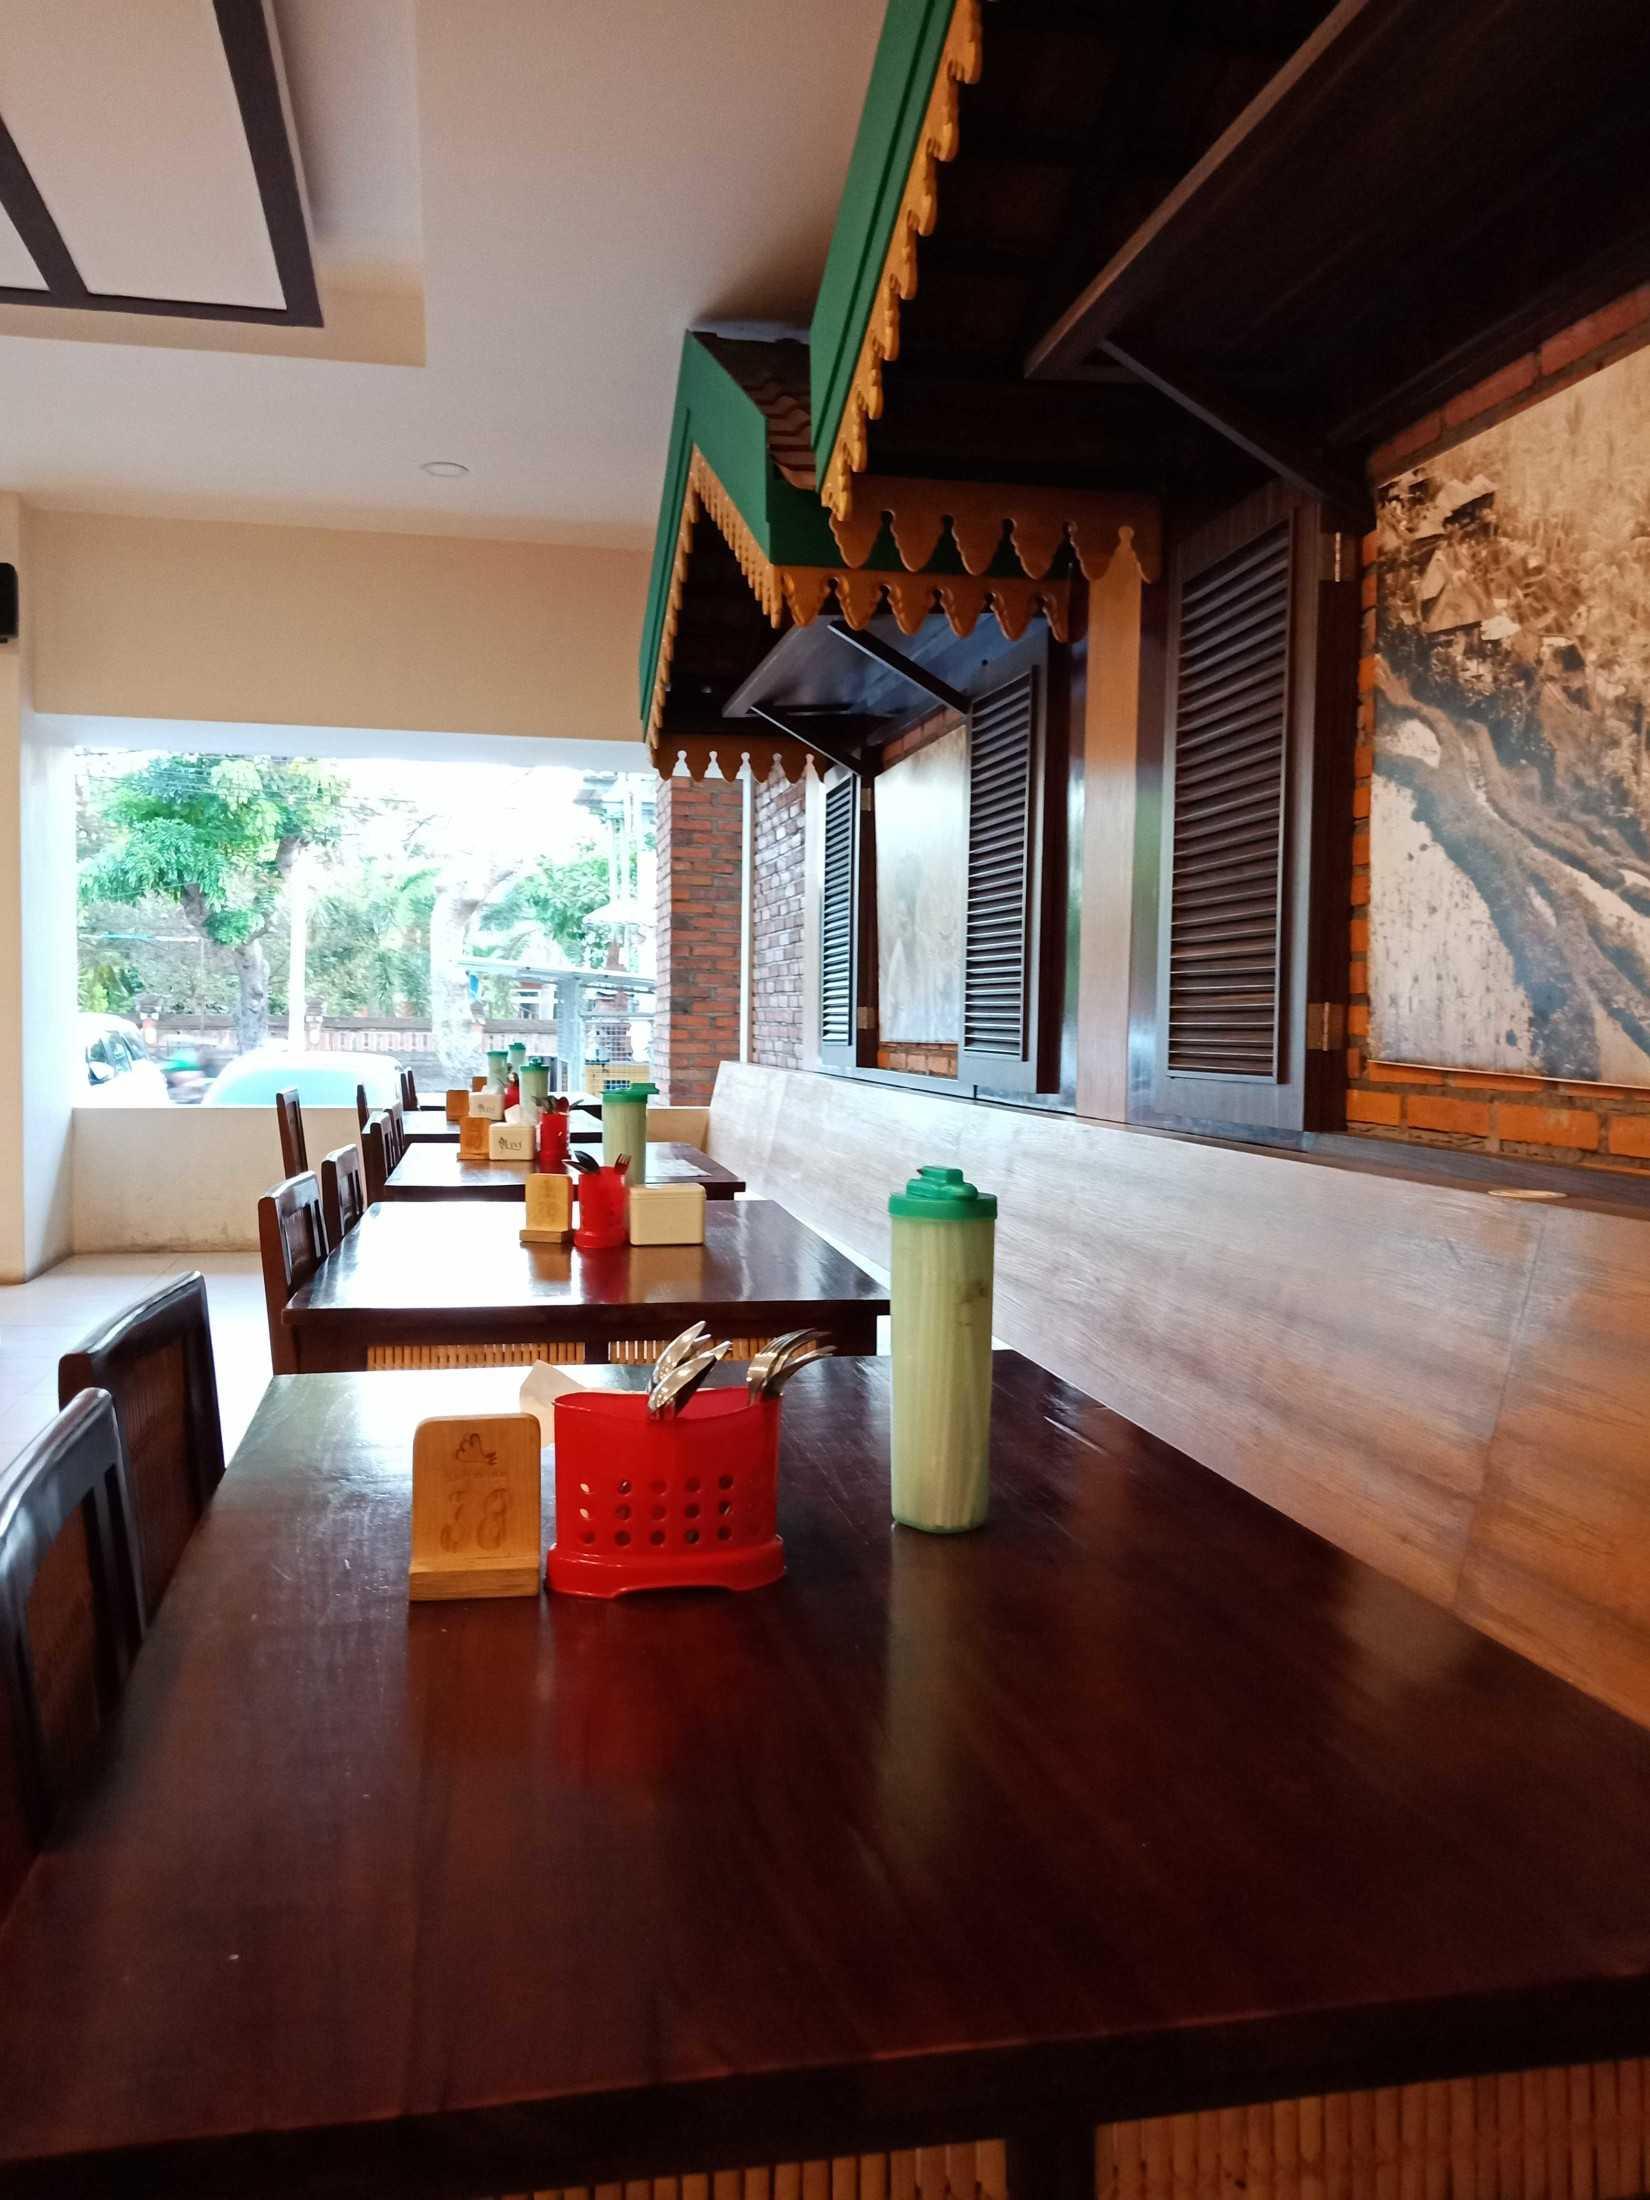 Roku+Architects Restaurant Lombok Idjo Renon Renon, Kec. Denpasar Sel., Kota Denpasar, Bali, Indonesia Renon, Kec. Denpasar Sel., Kota Denpasar, Bali, Indonesia Rokuarchitects-Restaurant-Lombok-Idjo-Renon  115896